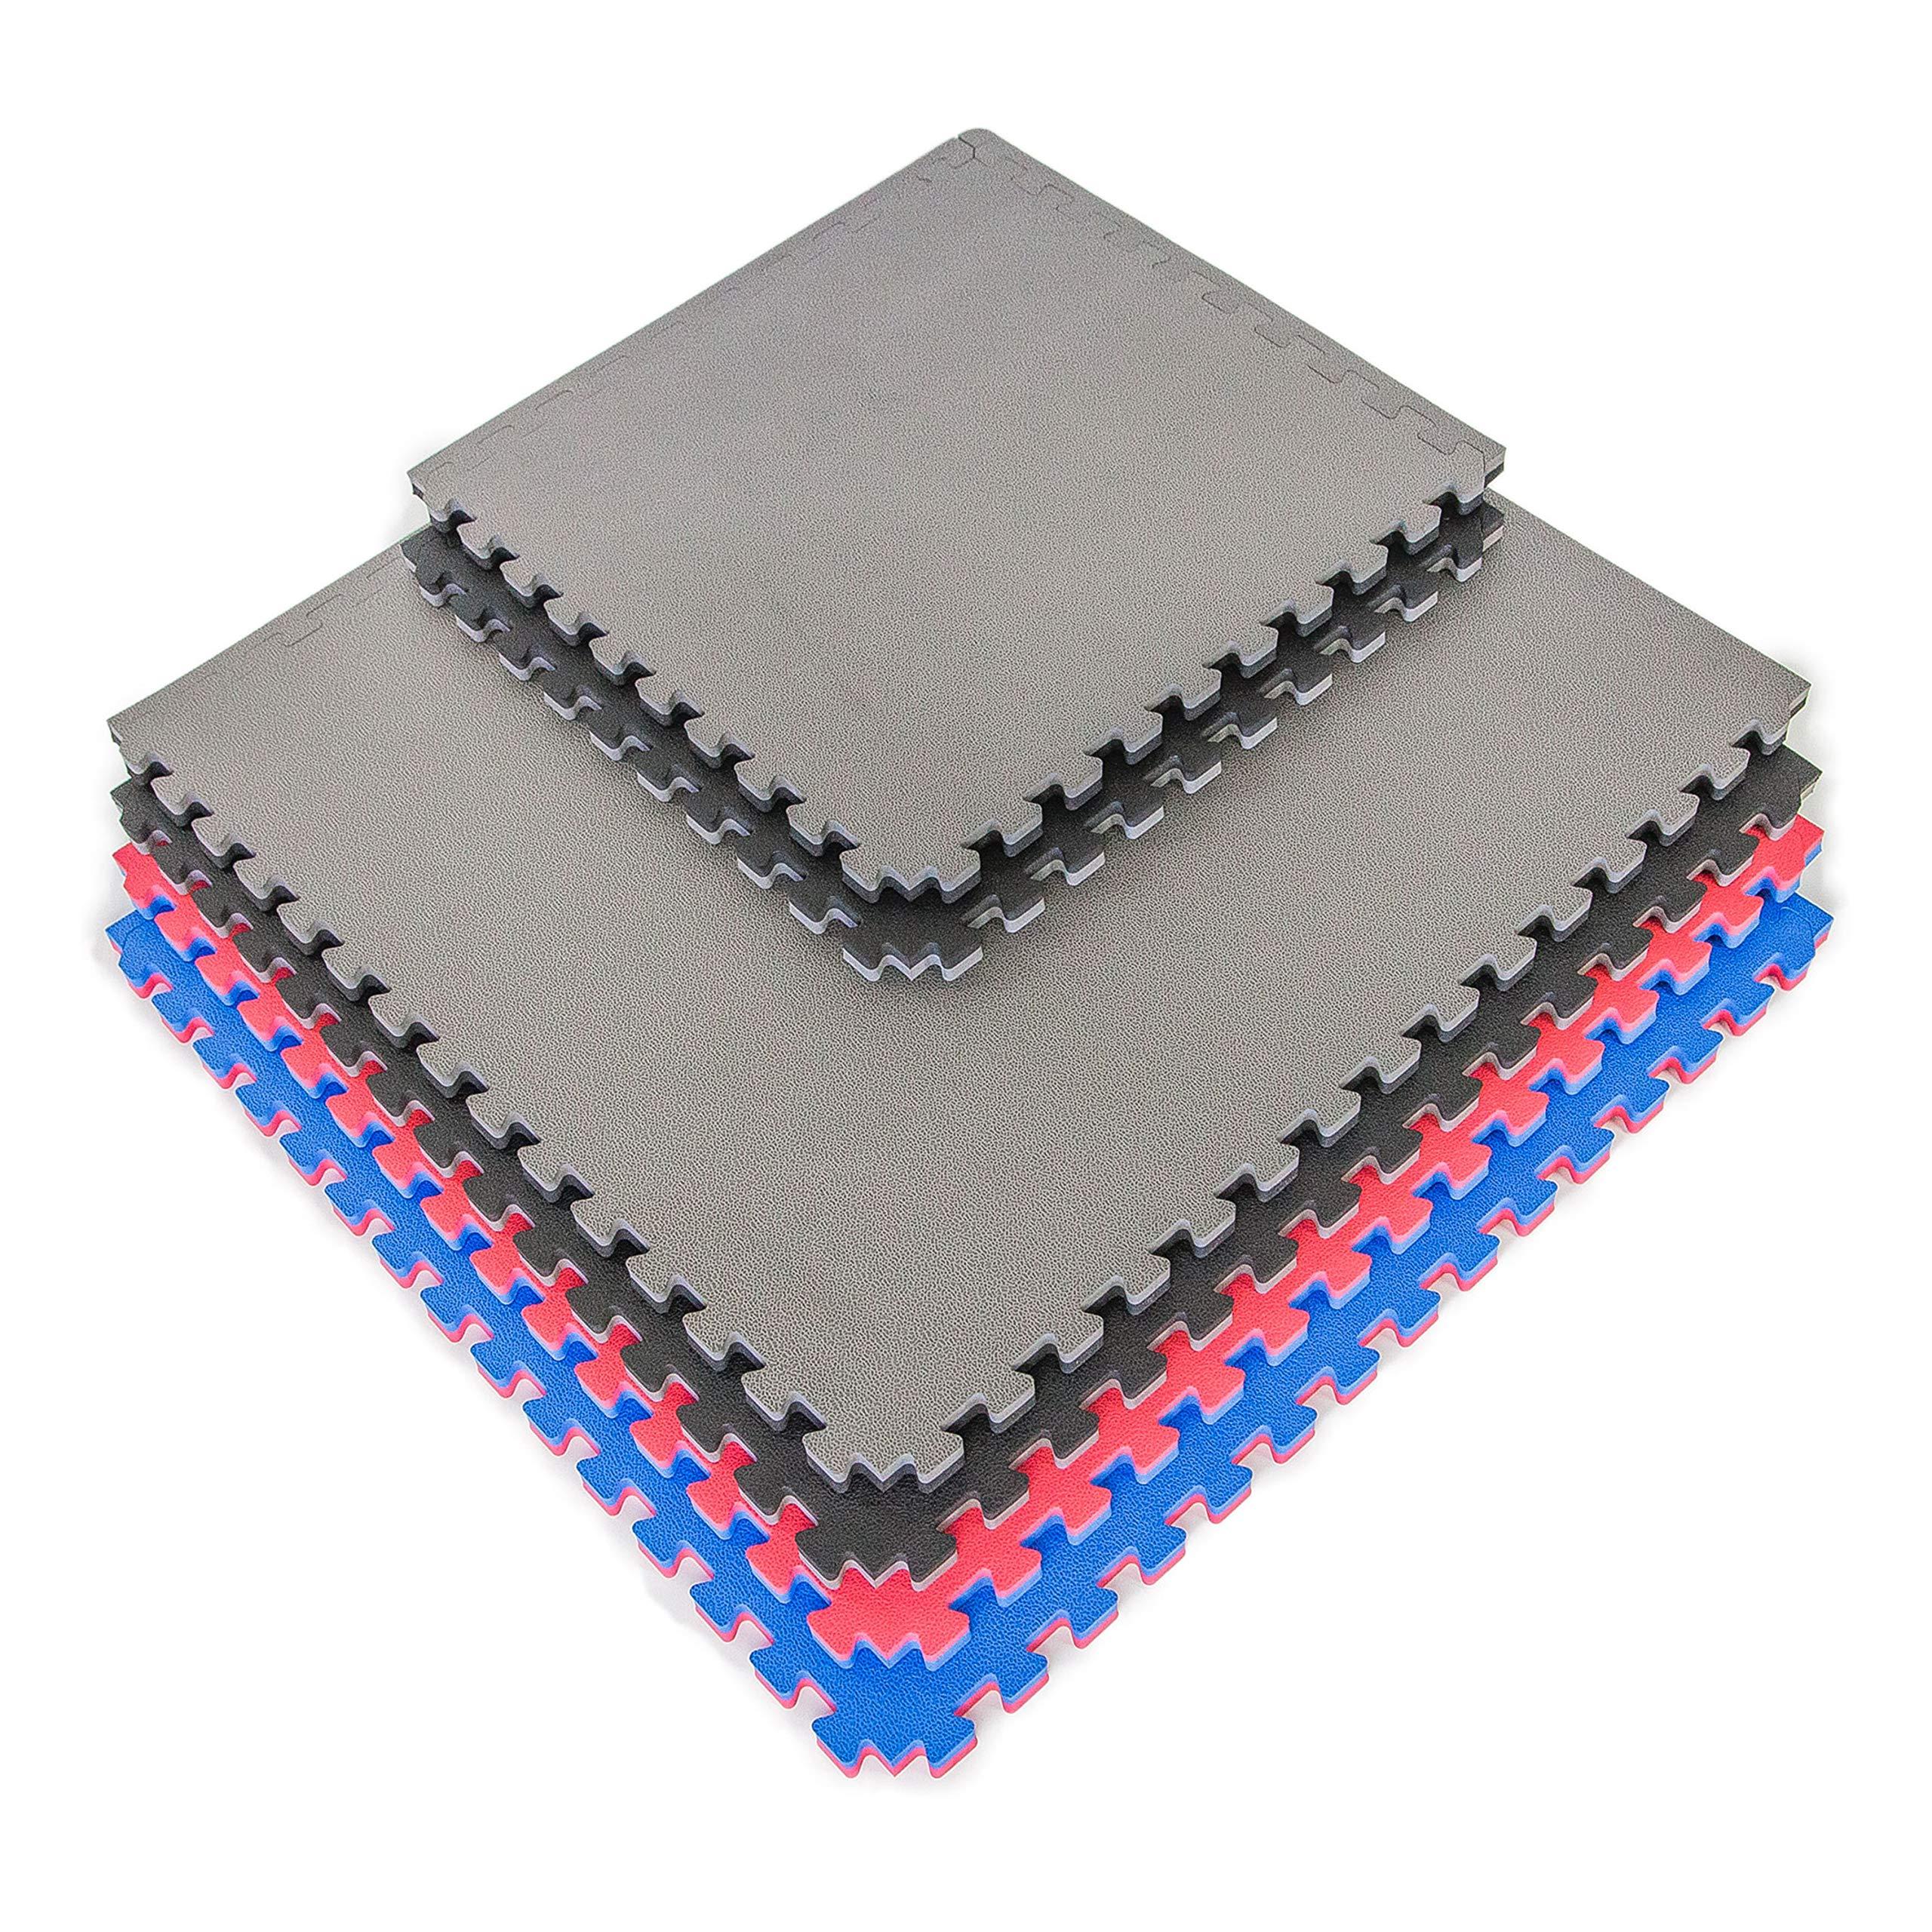 IncStores - 1'' MMA Interlocking Foam Tiles - Perfect for Martial Arts, Lightweight Home Gyms, p90x, Insanity, Gymnastics, Yoga, Cardio and Aerobics (Black/Grey, 5 Tiles (3ft x 3ft Tiles) 45 sqft)